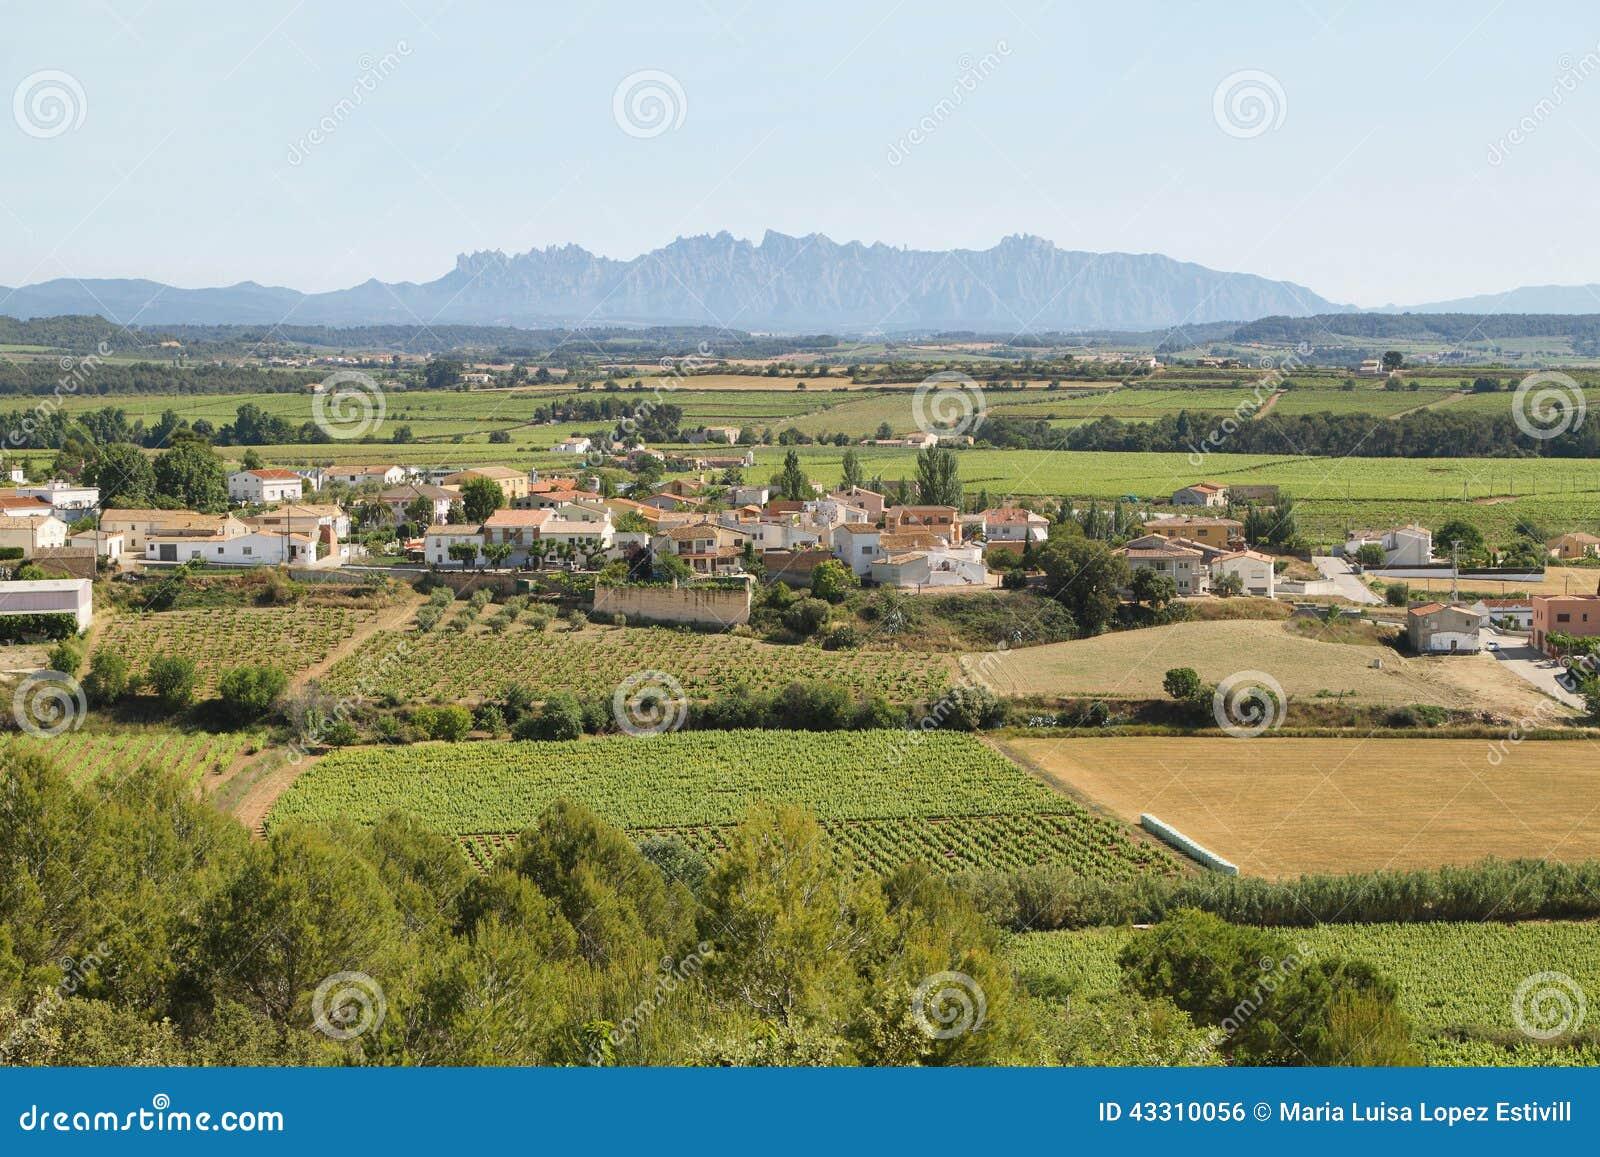 Vineyards with Montserrat peaks at background